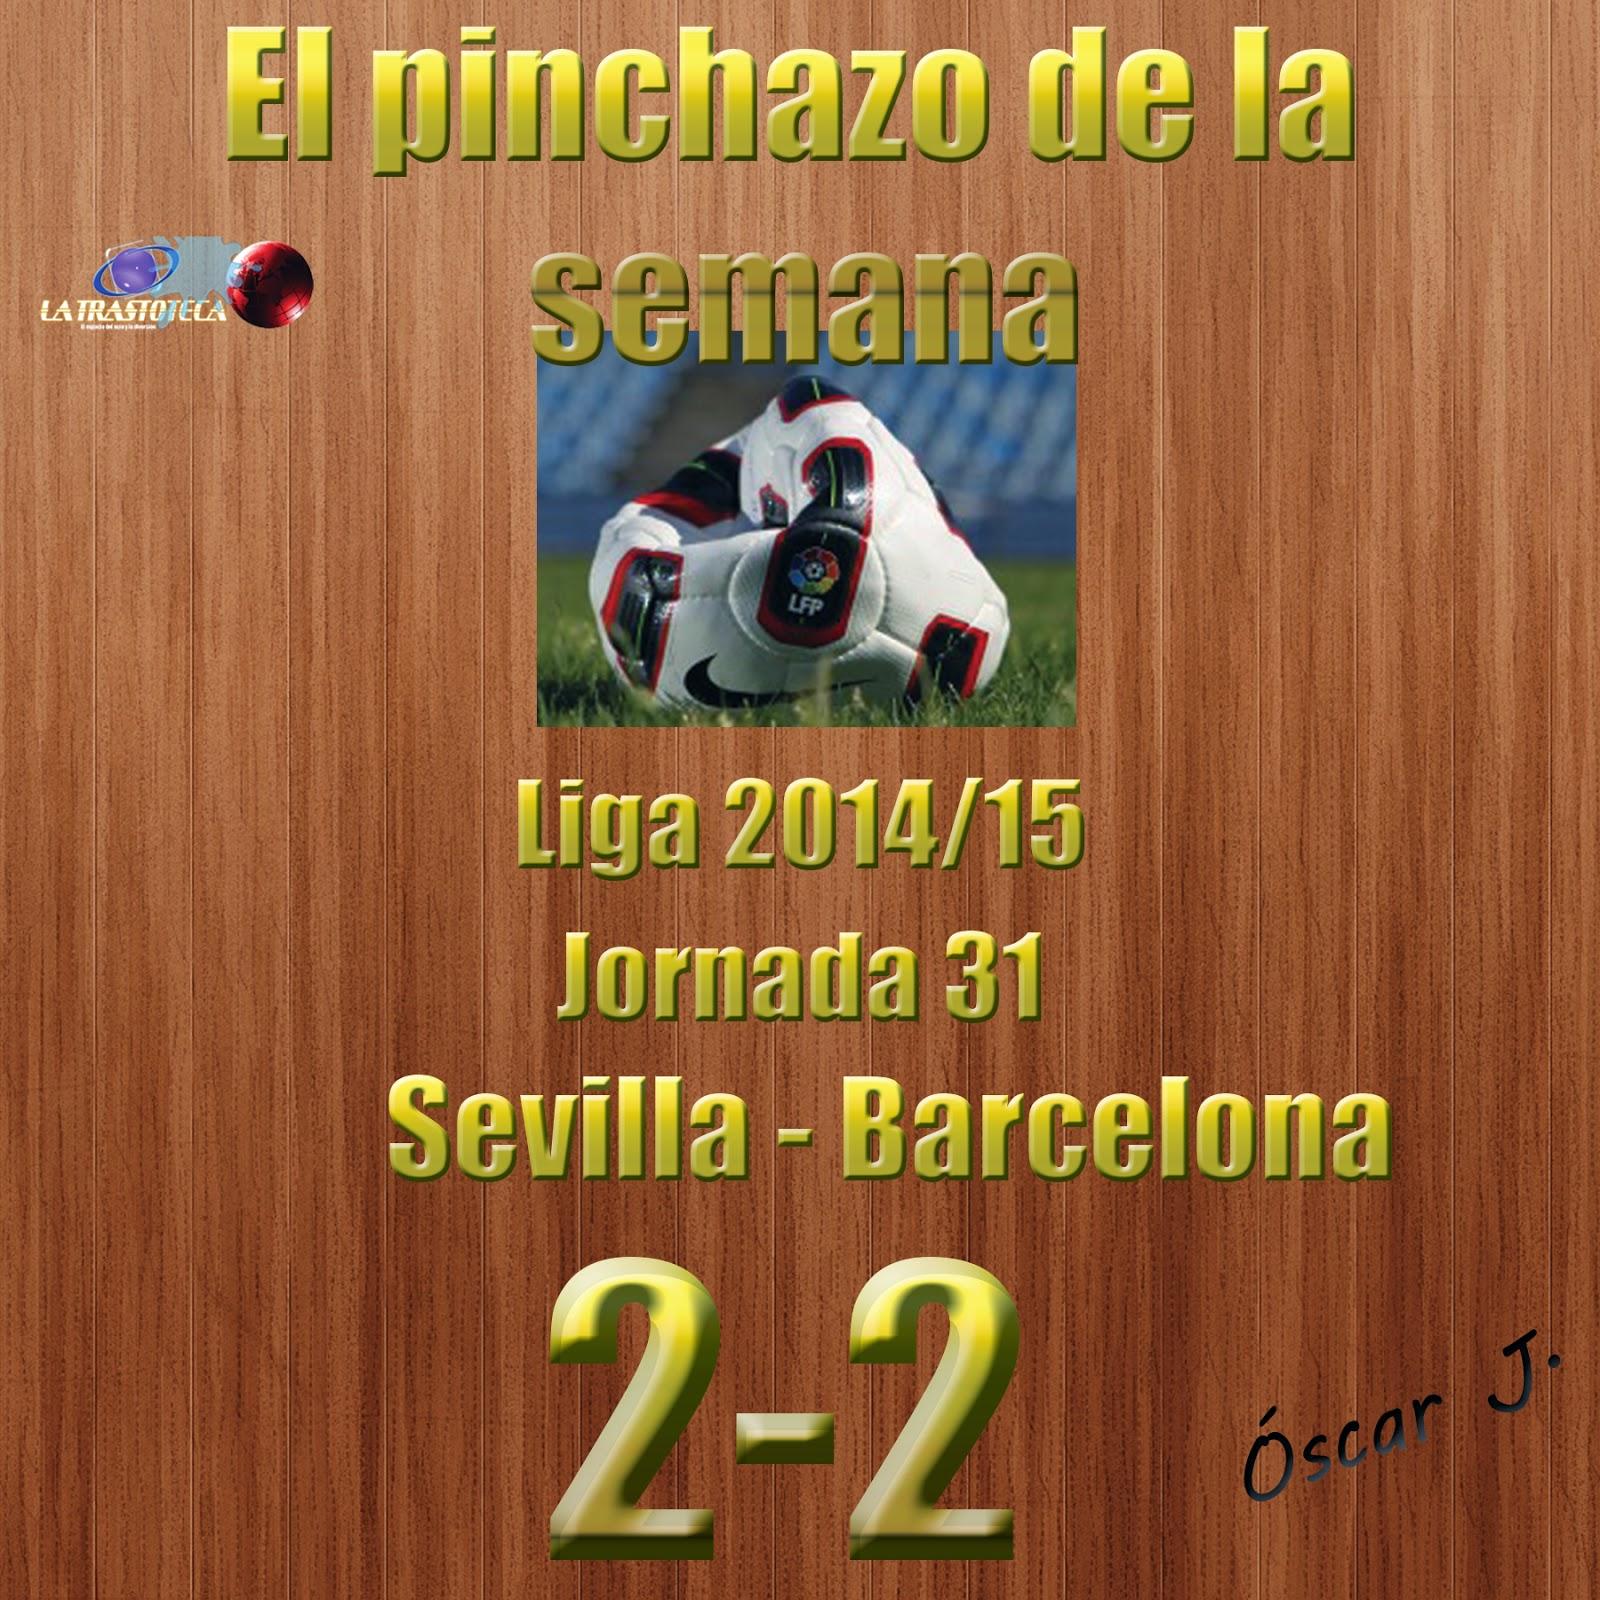 Sevilla 2-2 Barcelona. Liga 2014/15. Jornada 31. El pinchazo de la semana.